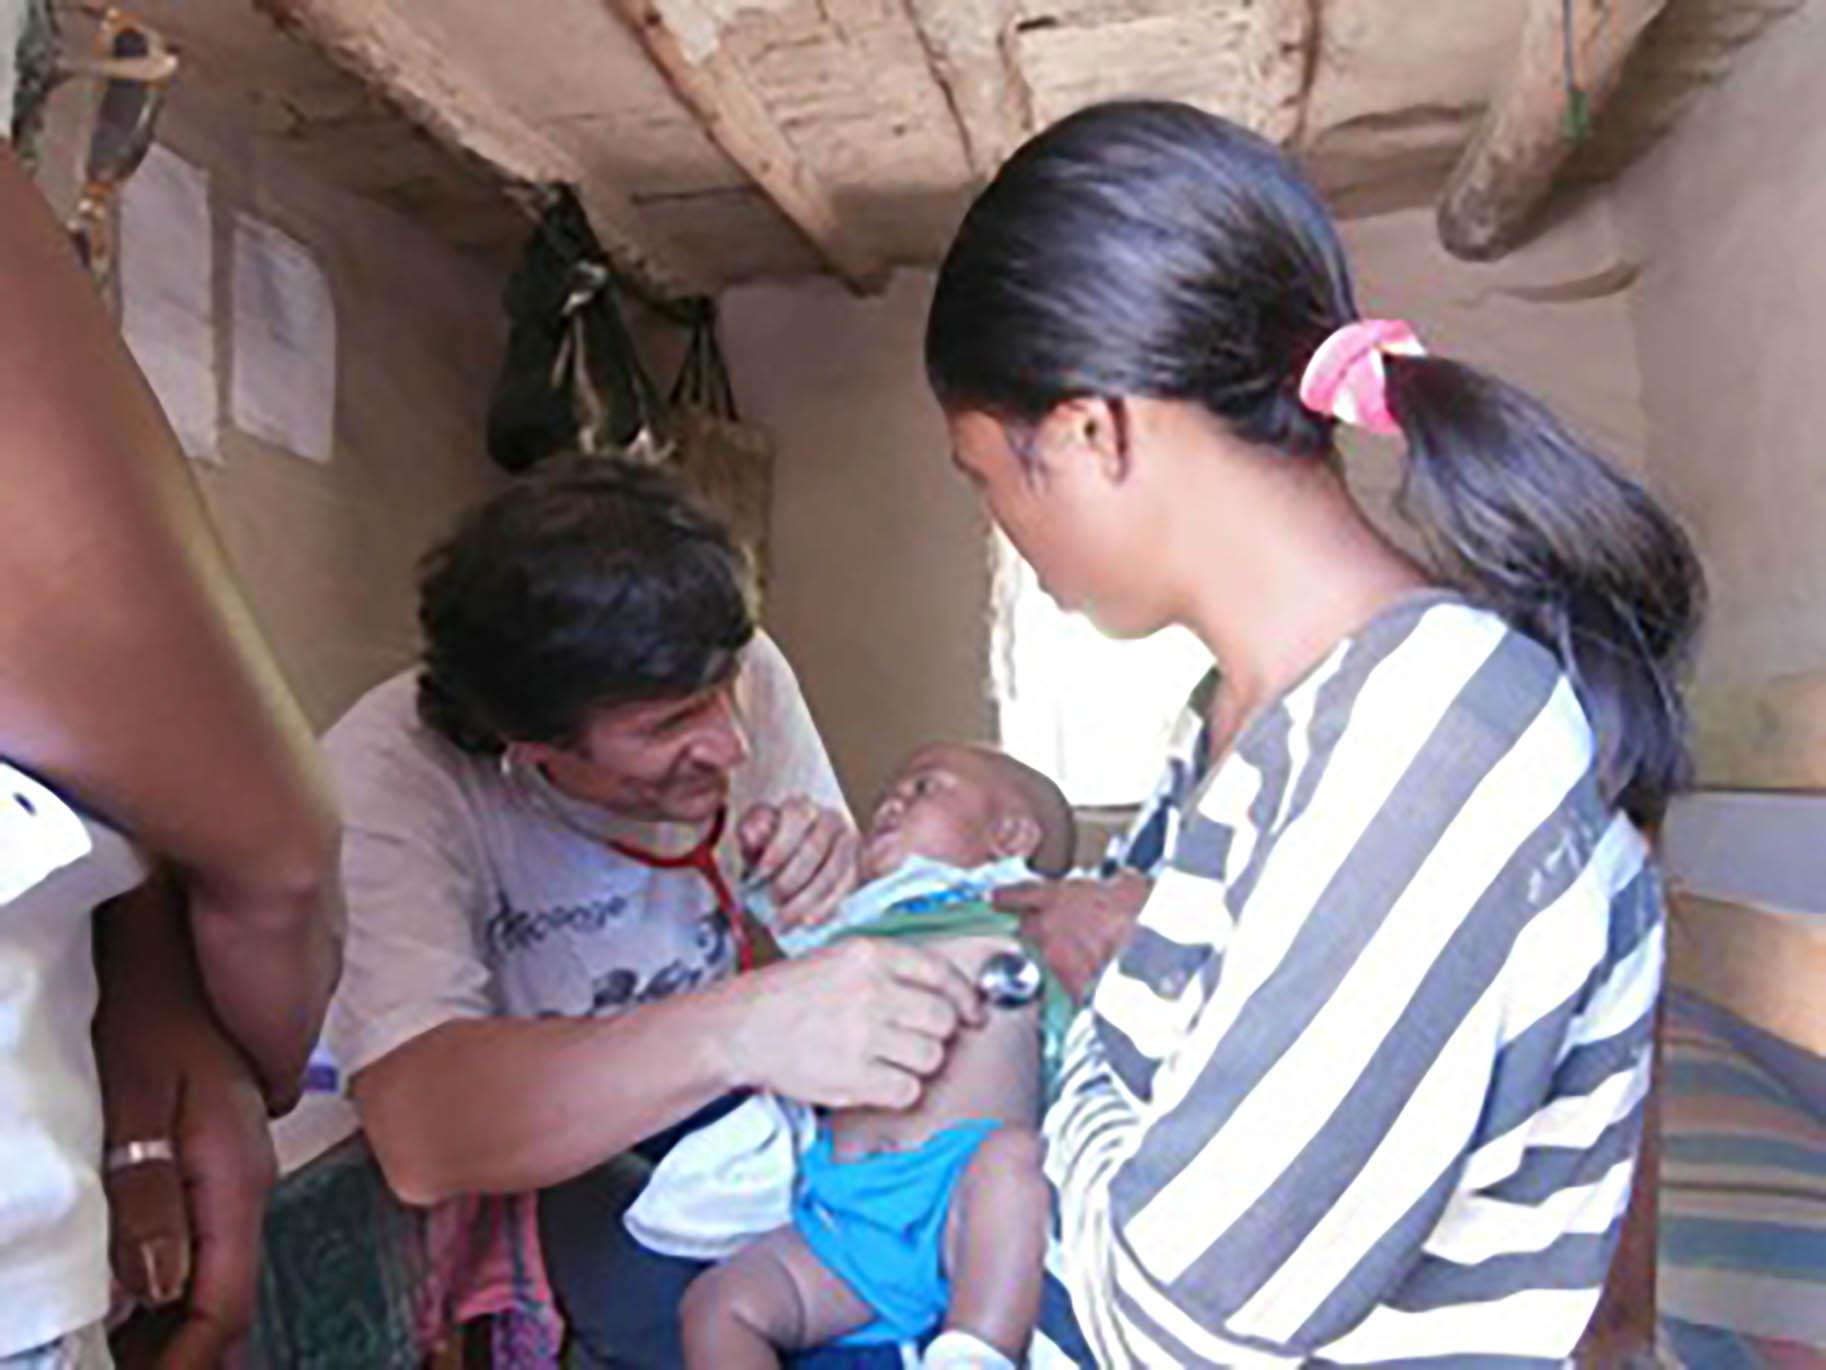 pediatra visita bambino africano